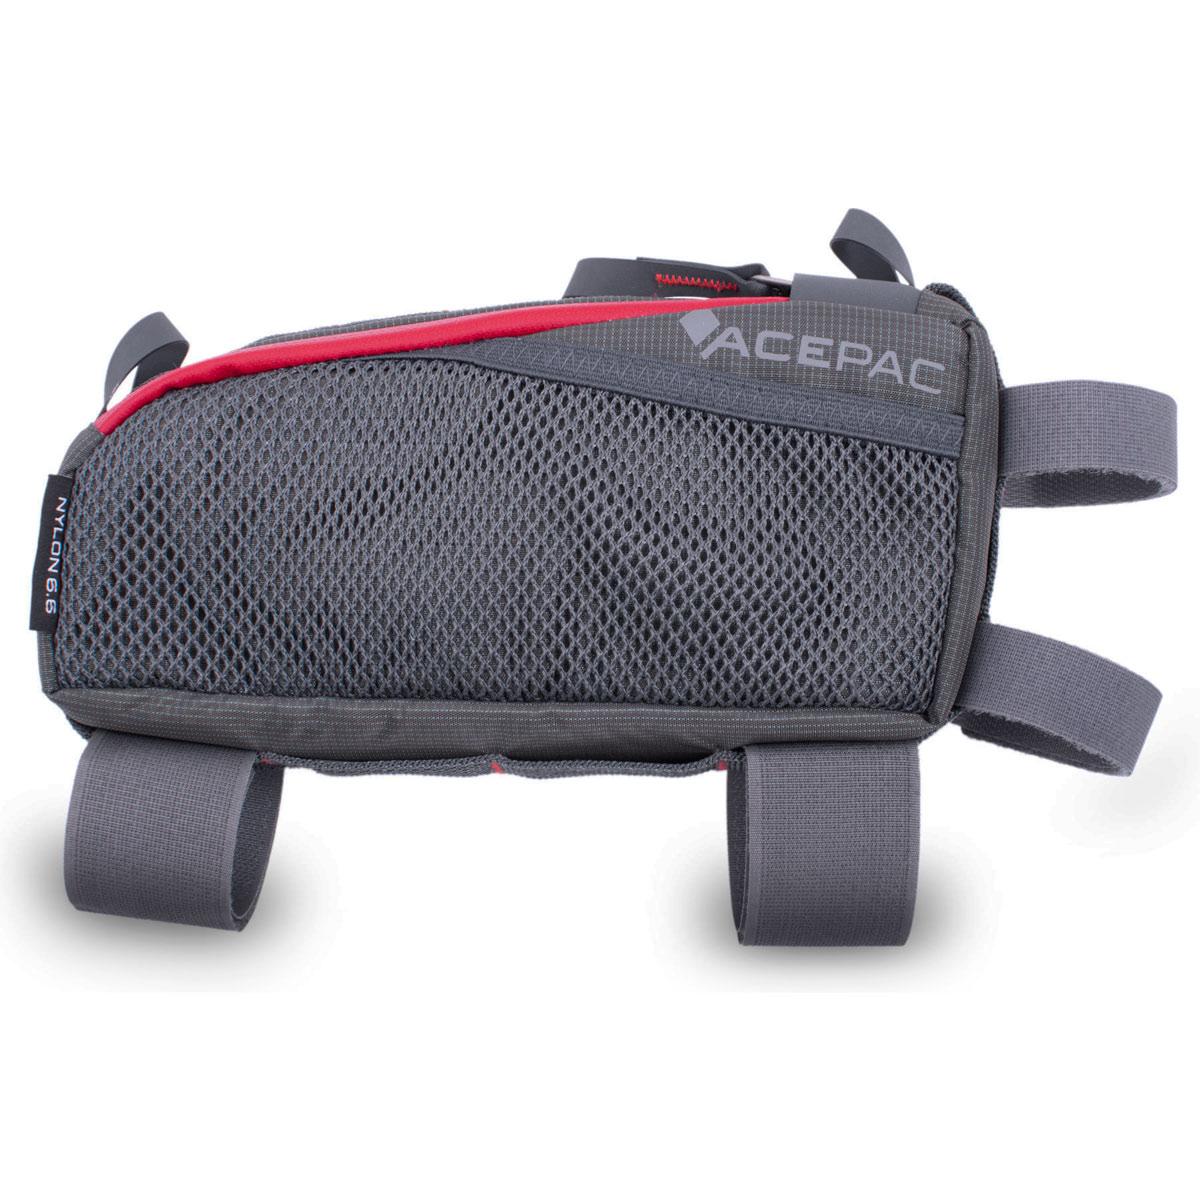 Acepac Fuel Bag - Frame Bag Size M - grey